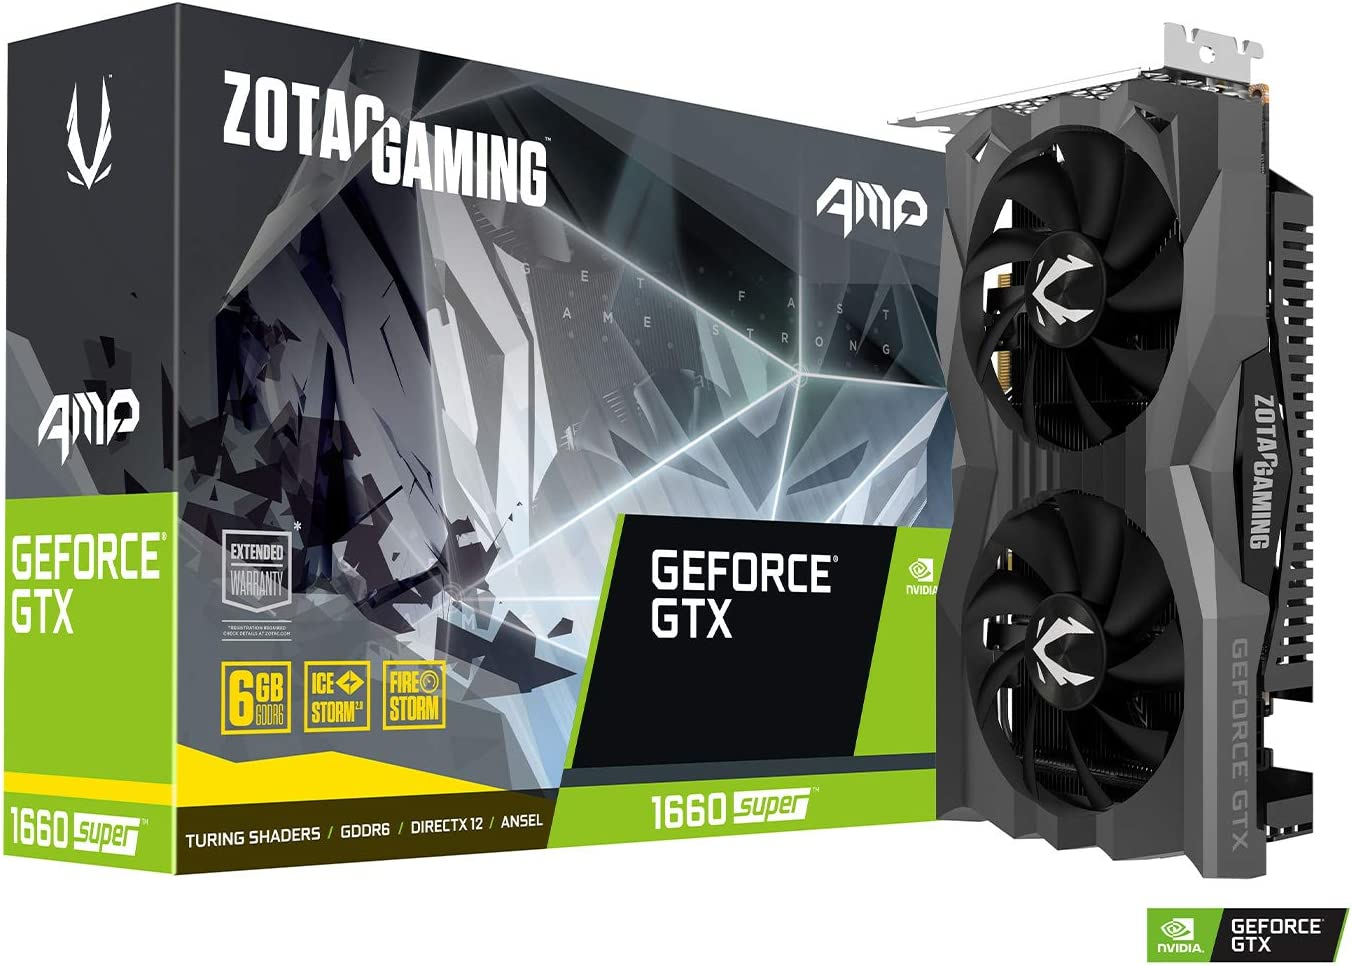 ZOTAC Gaming GeForce GTX 1660 Super AMP Edition 6GB GDDR6 Tarjeta gráfica HDMI/3xDP